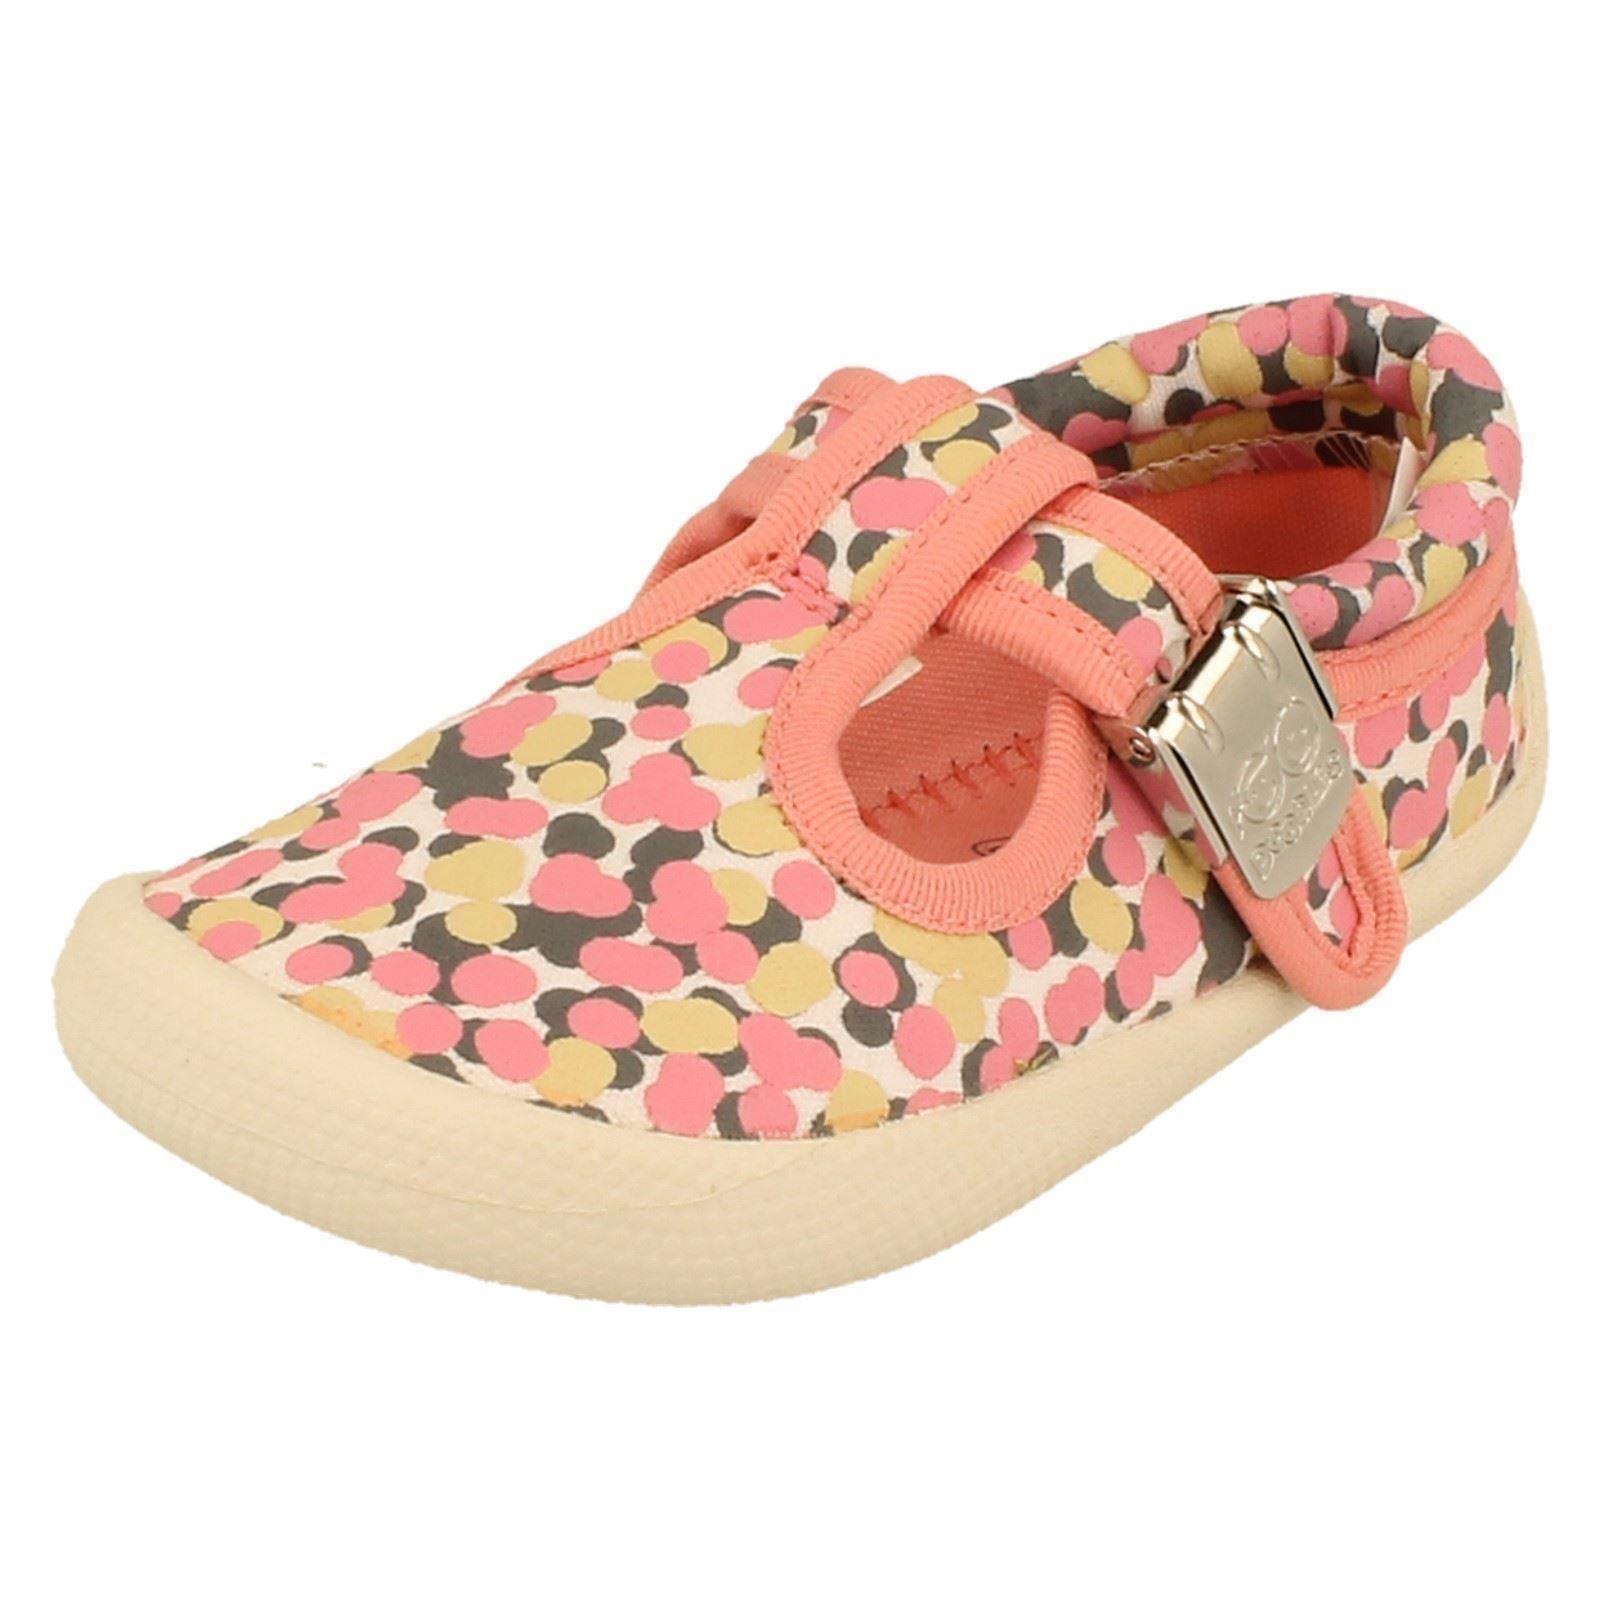 Girls Clarks Canvas Shoes Style - Choc Cake